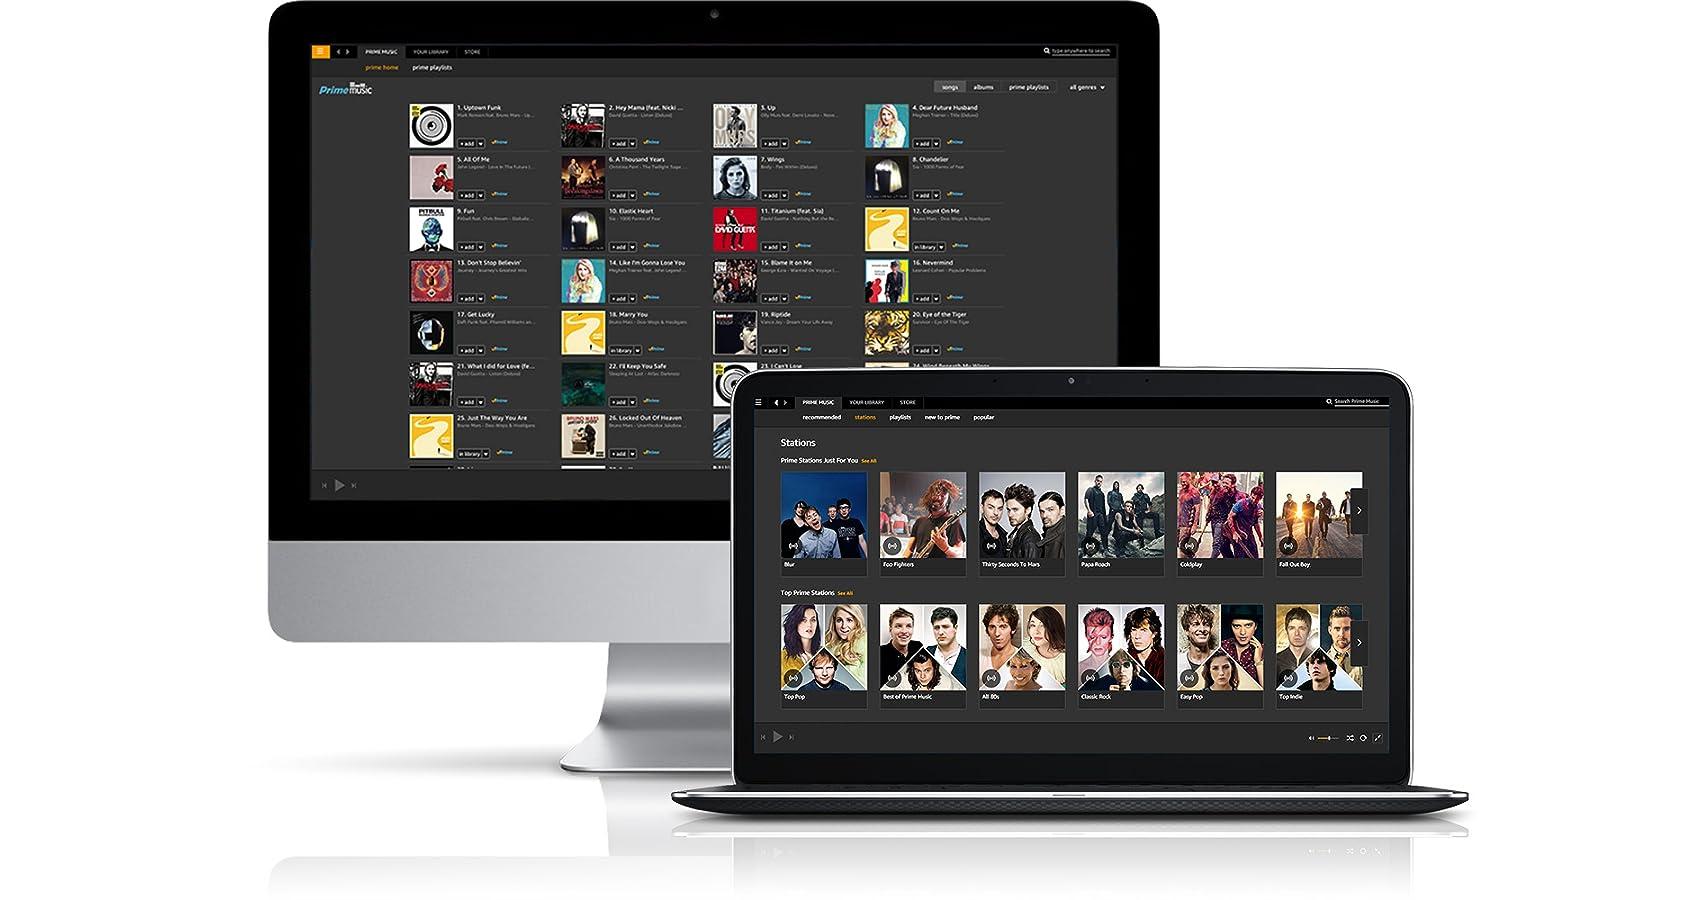 Prime Music on Mac & PC